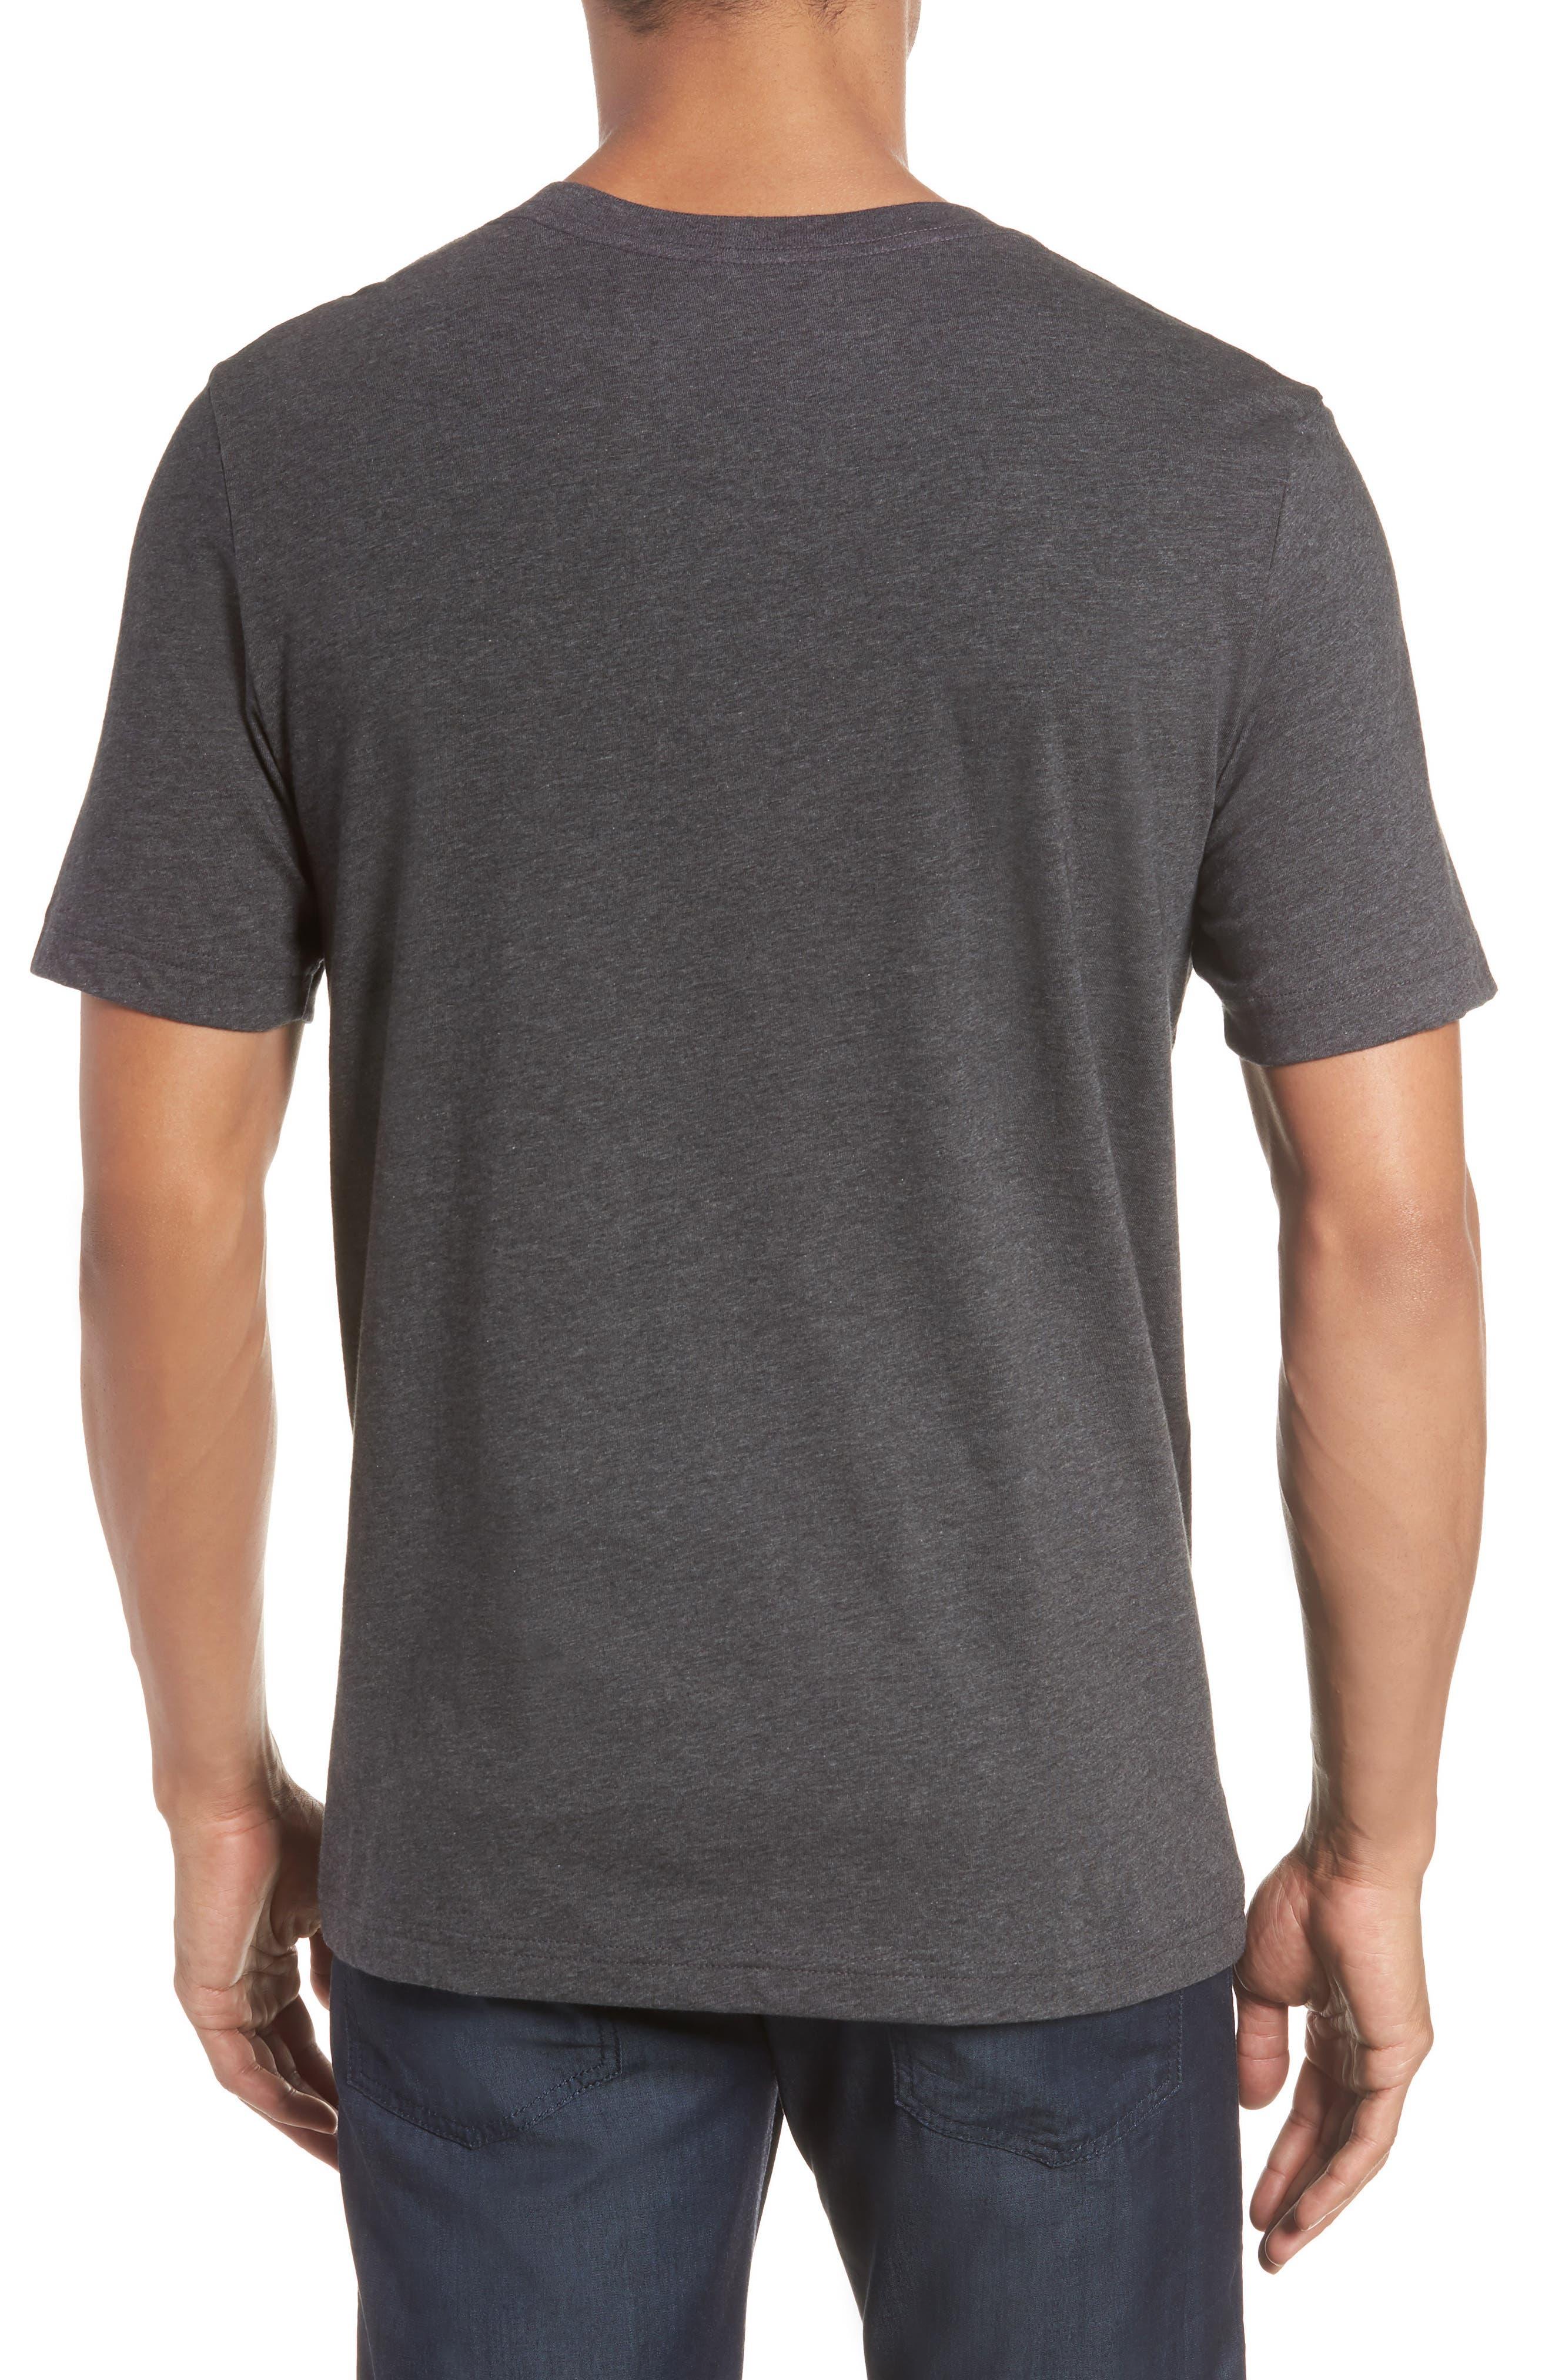 Flogging Print Pocket T-Shirt,                             Alternate thumbnail 2, color,                             Heather Grey Pinstripe